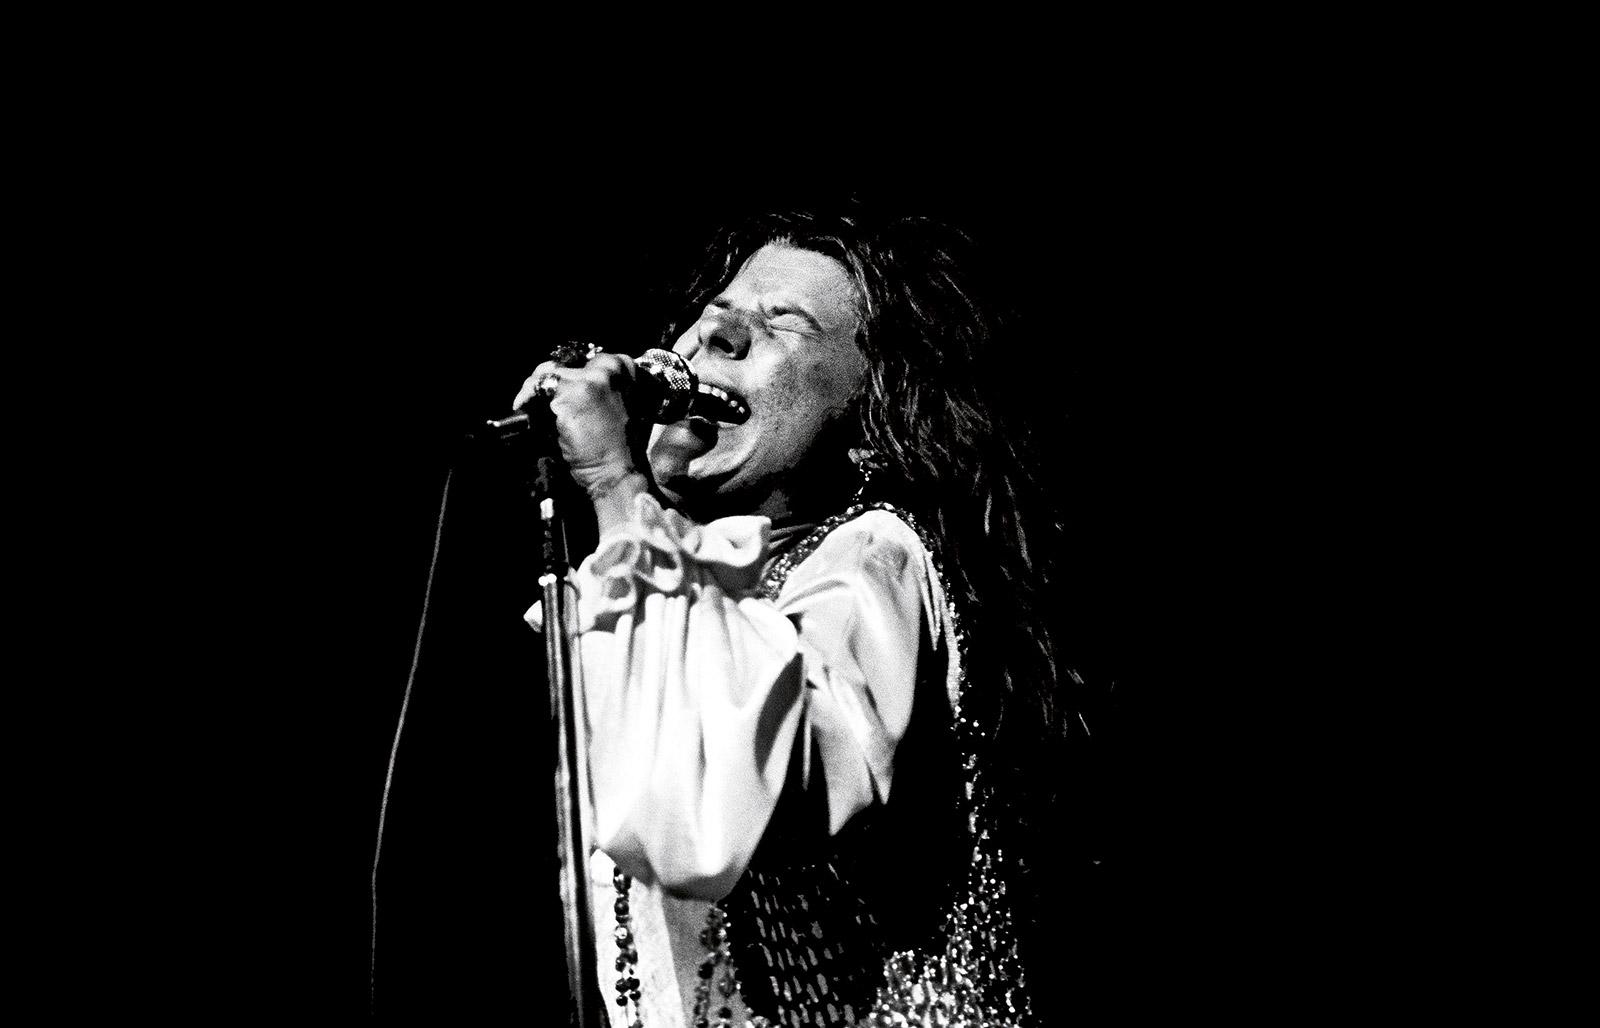 Дженис Джоплин, 1970 (photo © Neil Preston)